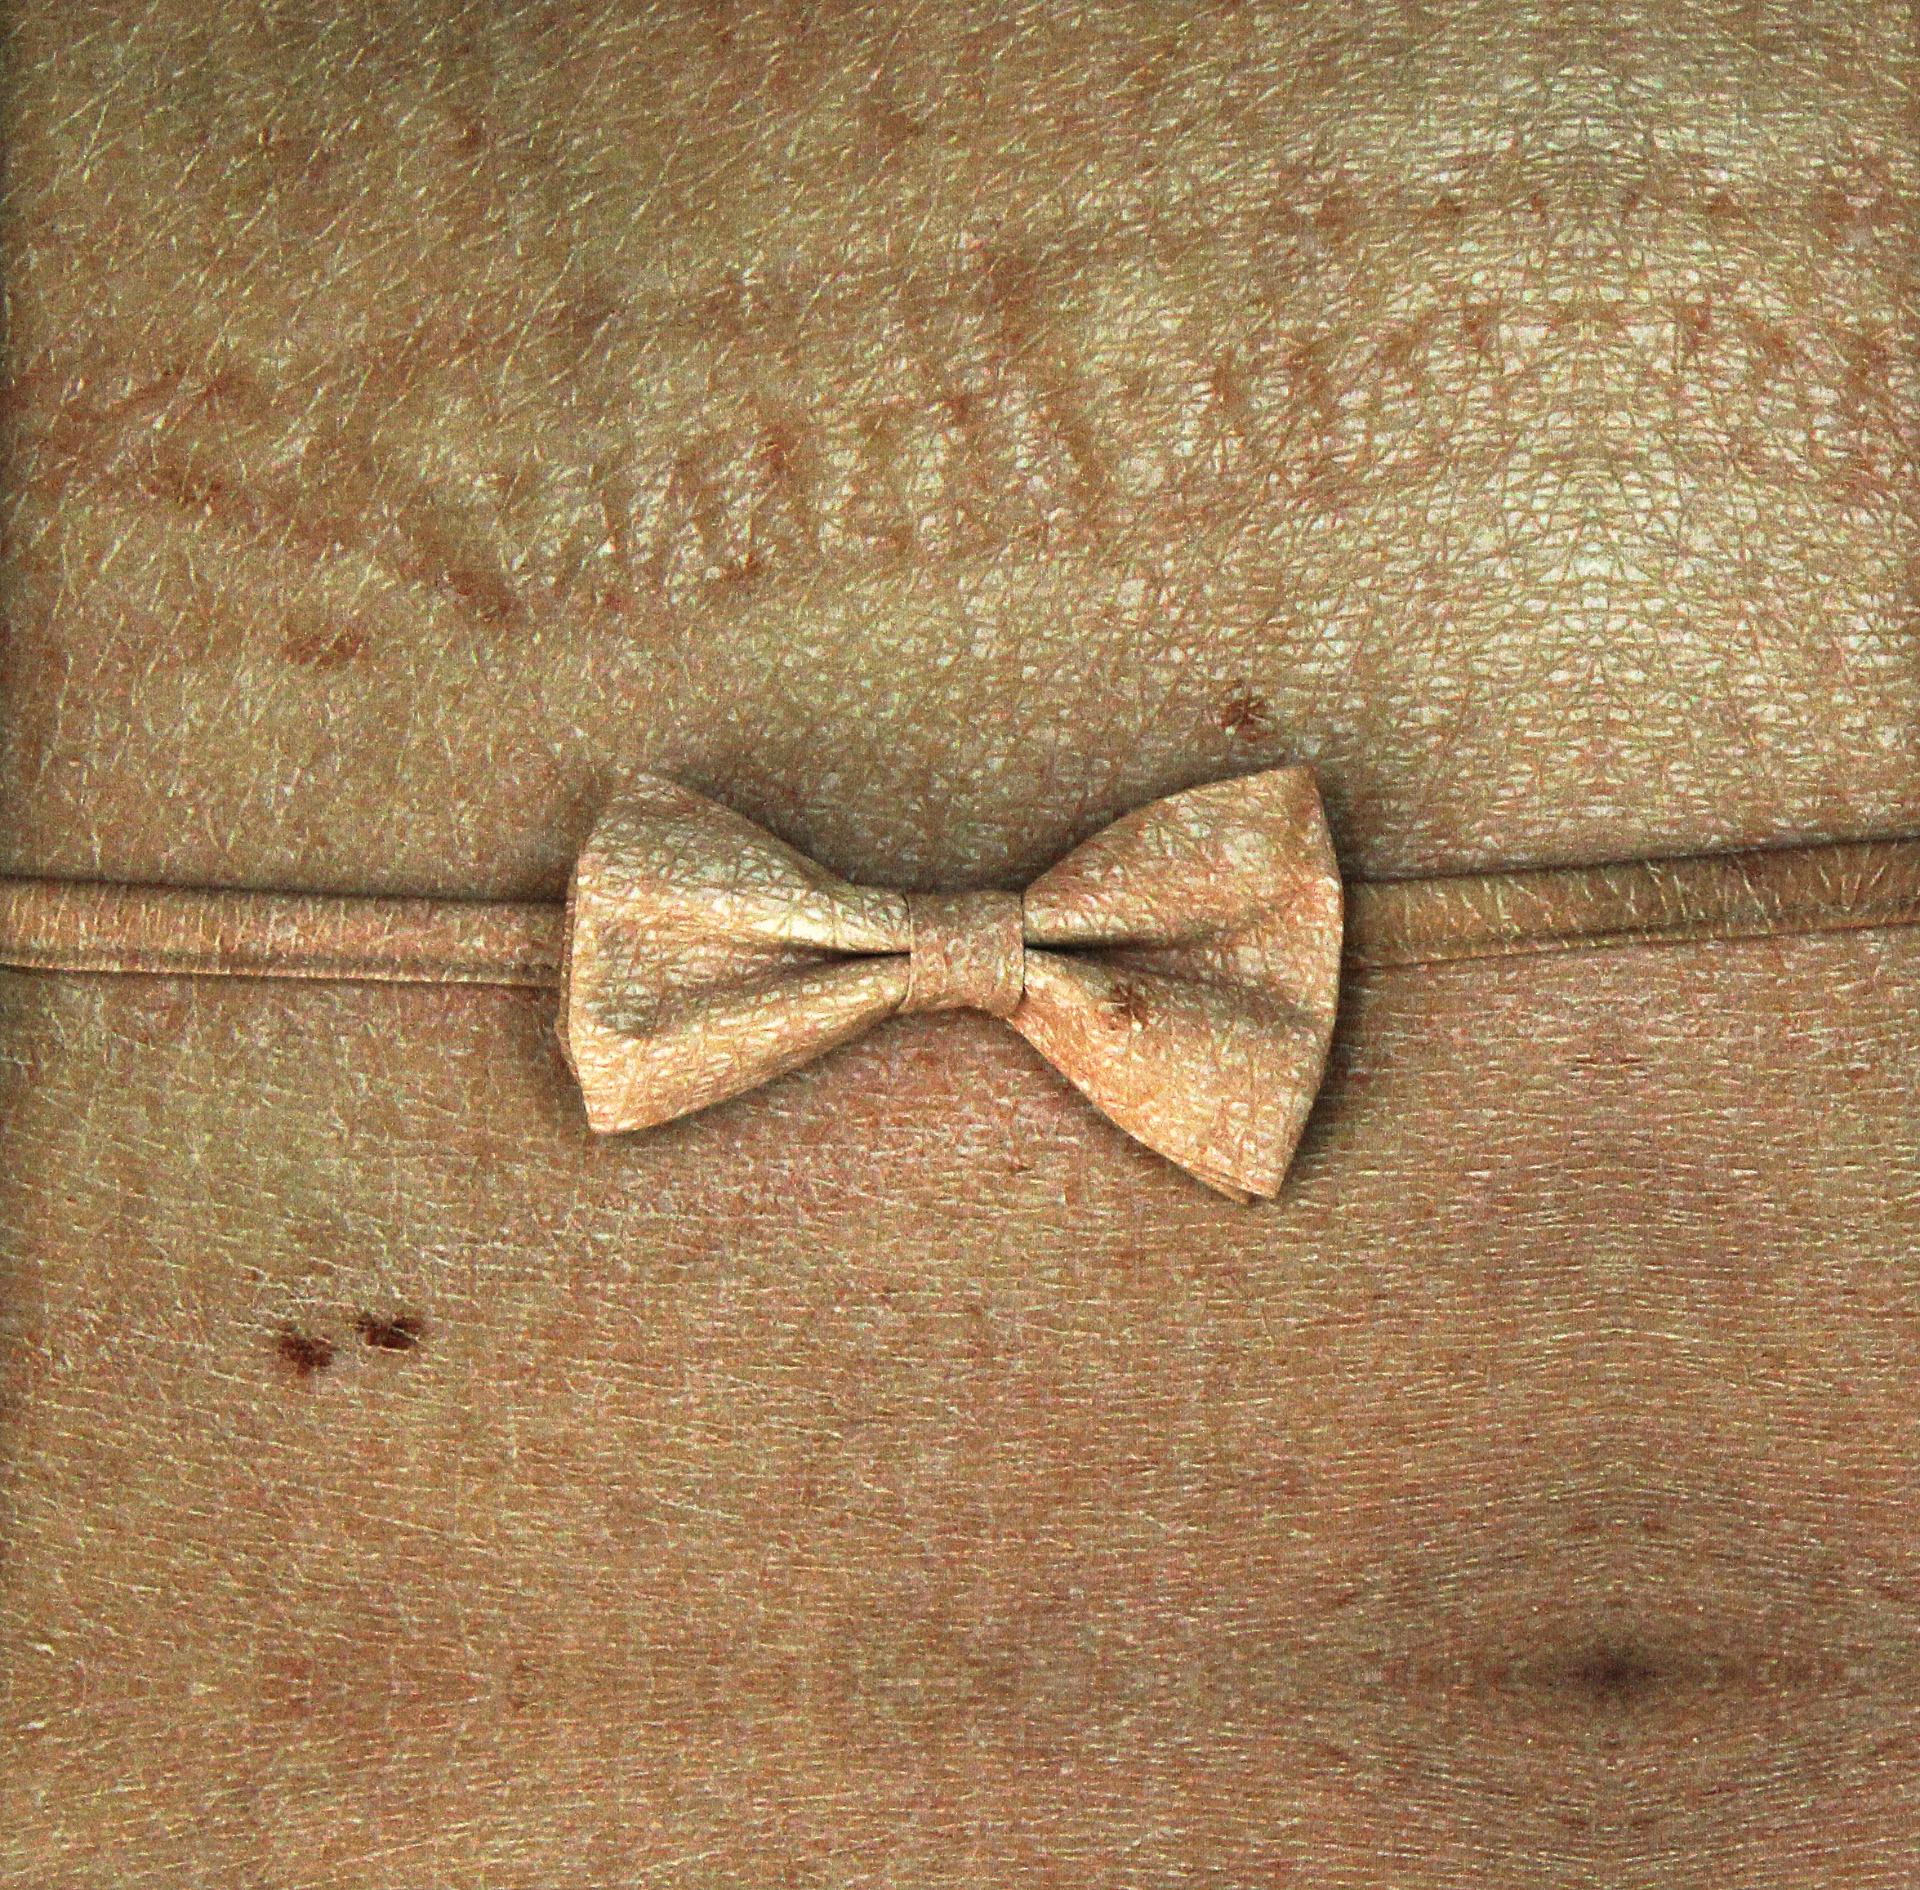 Skin Ties and Bow-Ties (2014-)